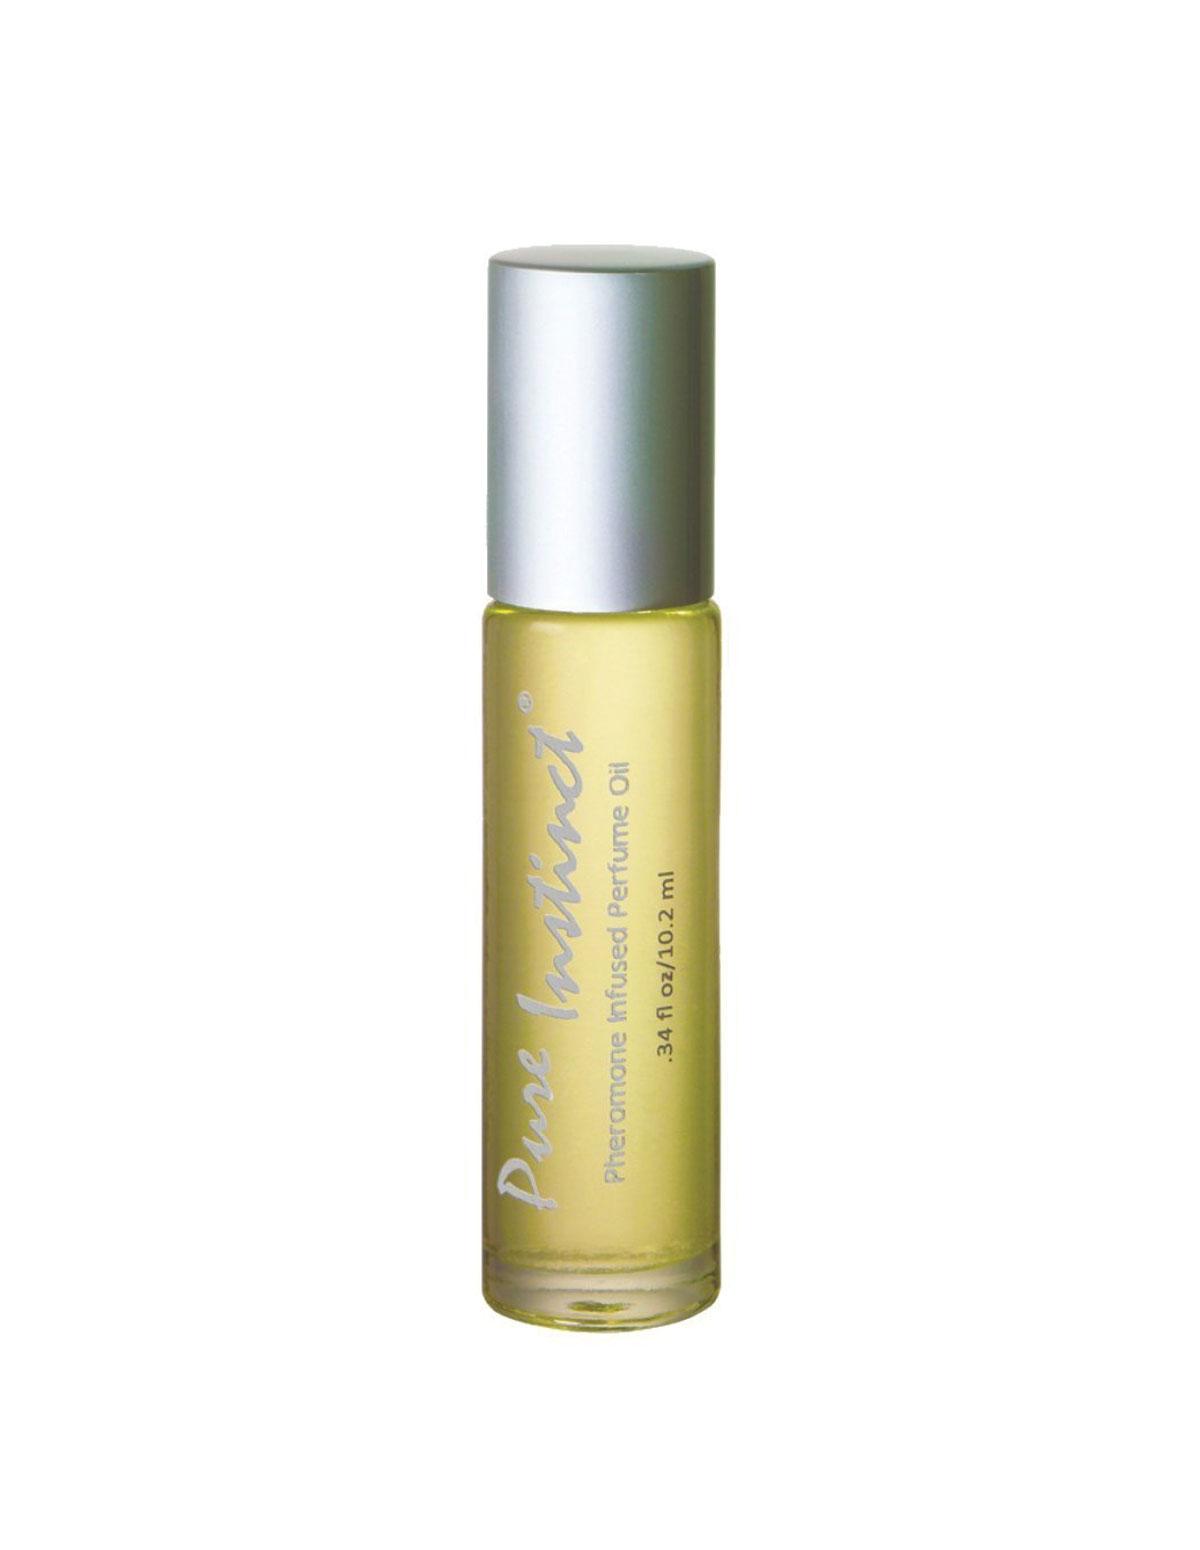 pure instinct pheromone fragrance attractant perfume woman attract